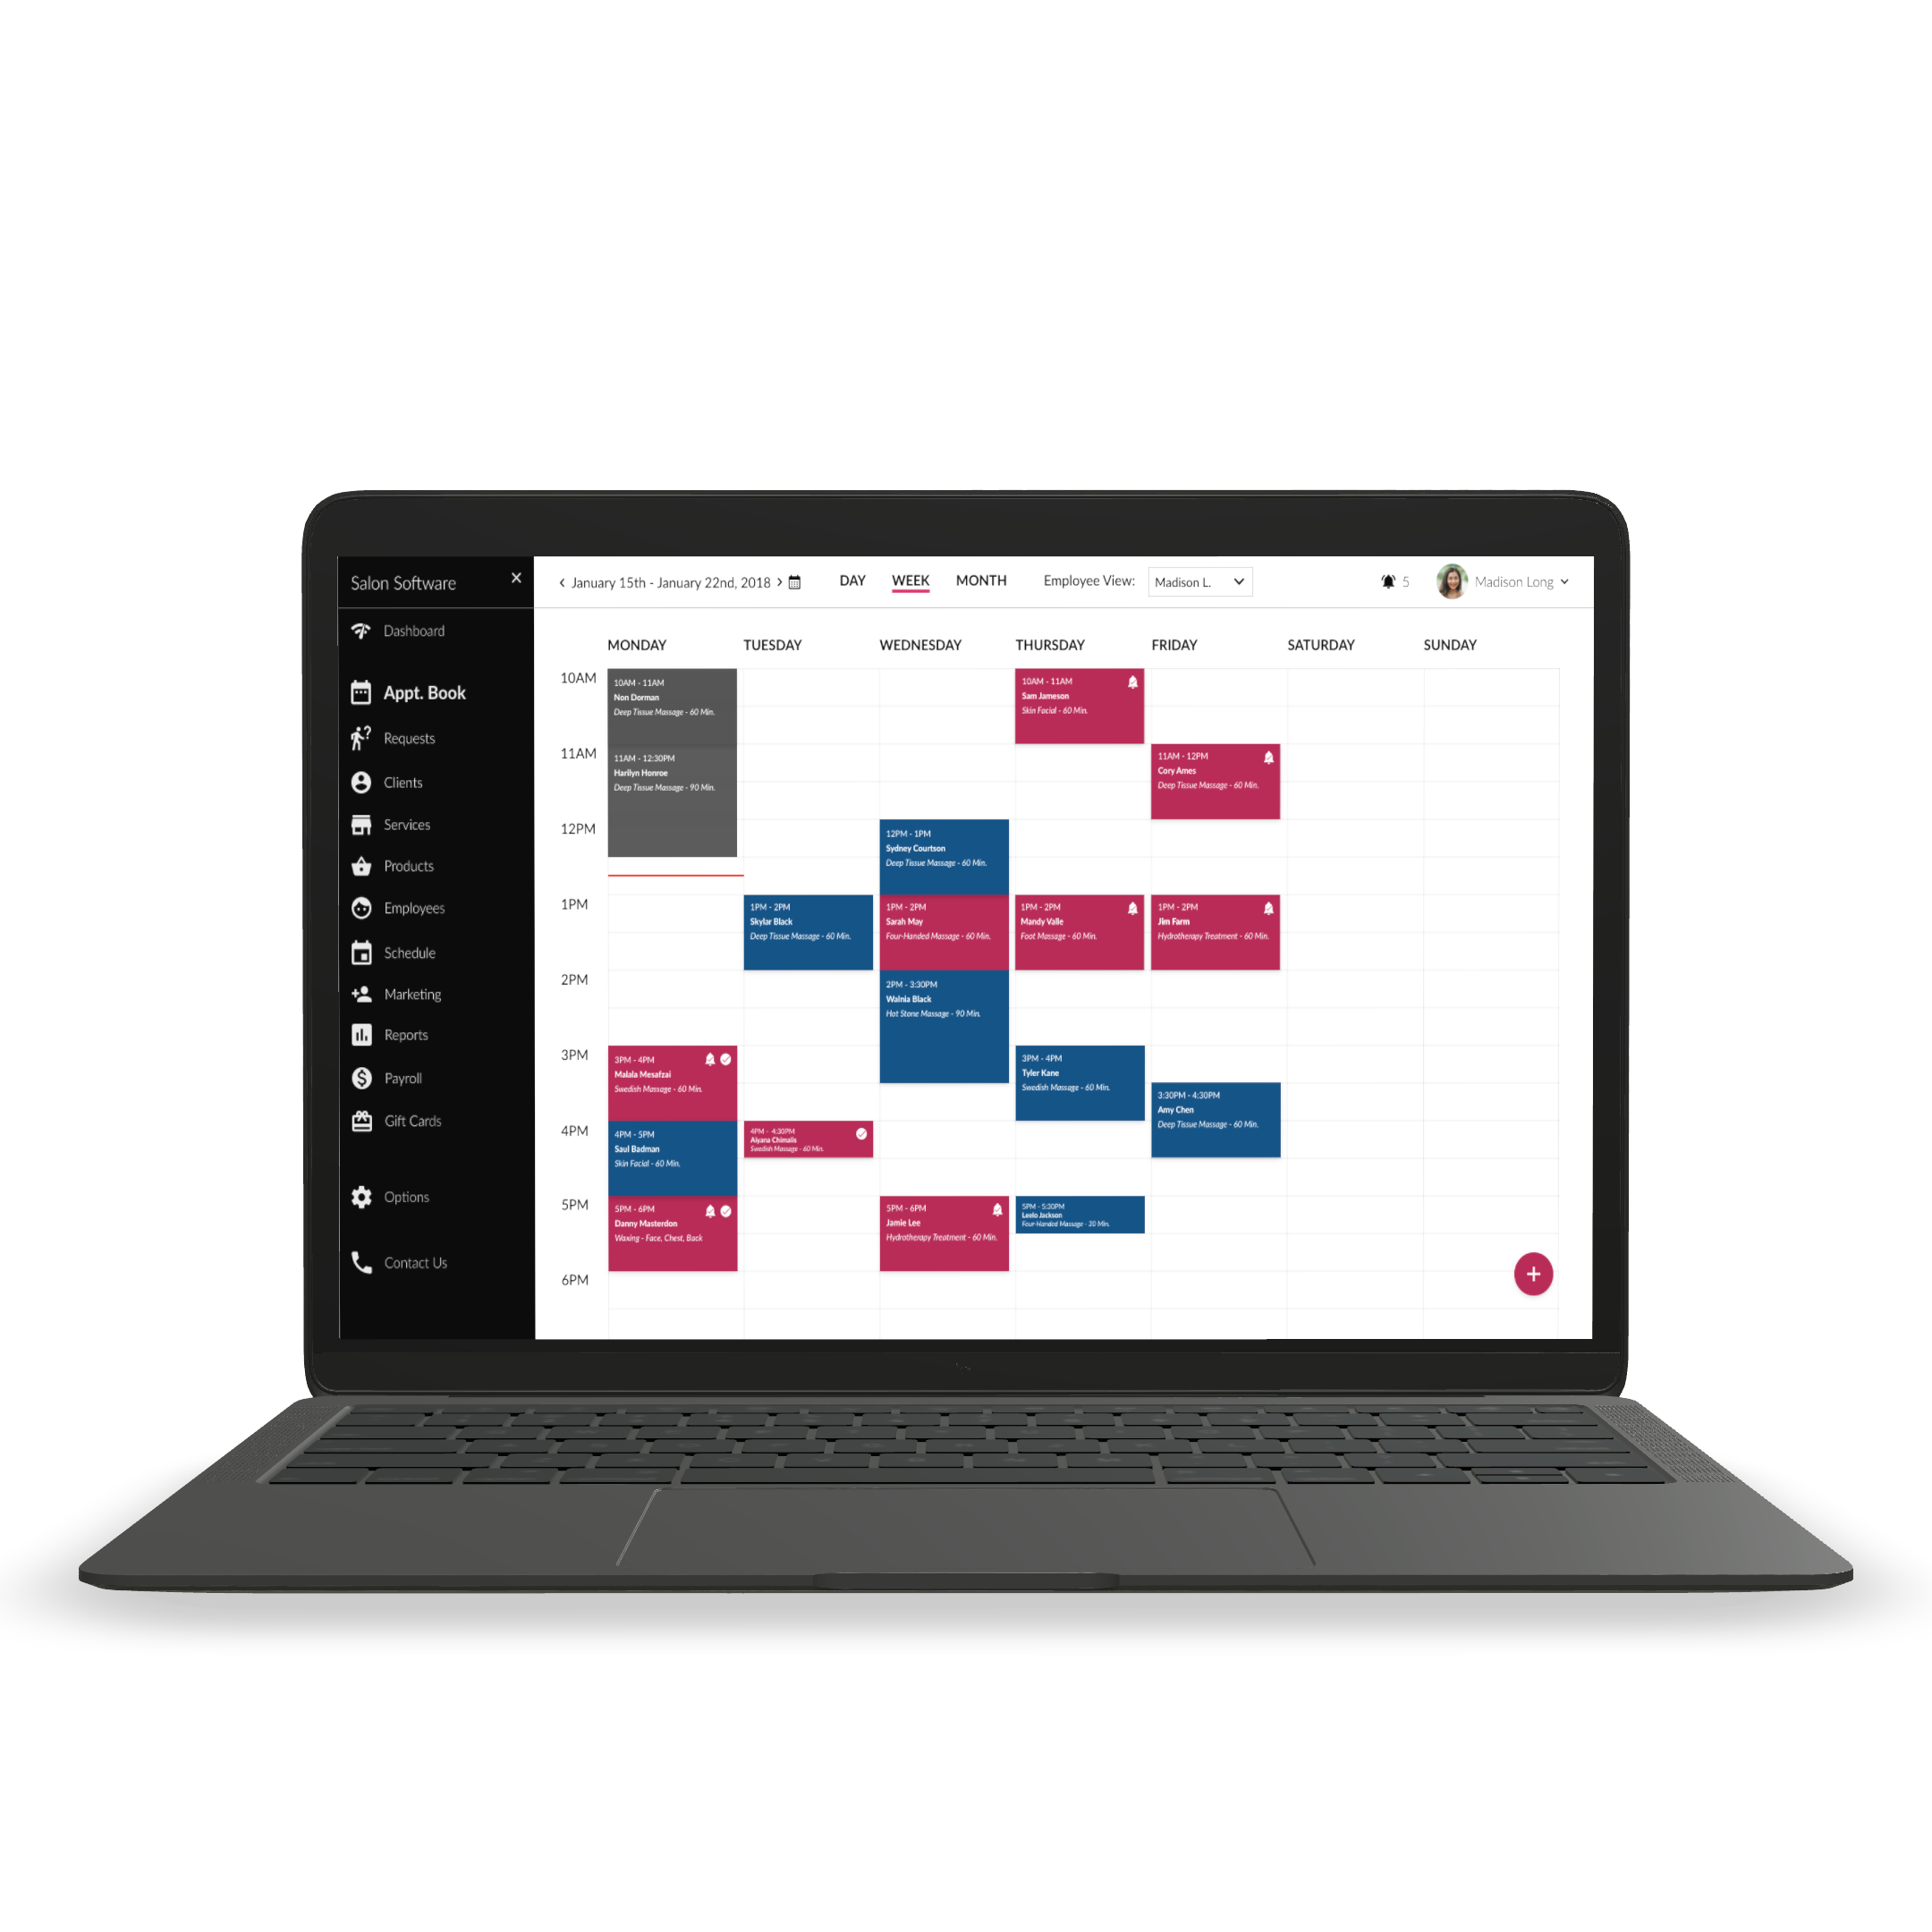 Salon Software Revitalized - DaySmart SoftwareLearn More